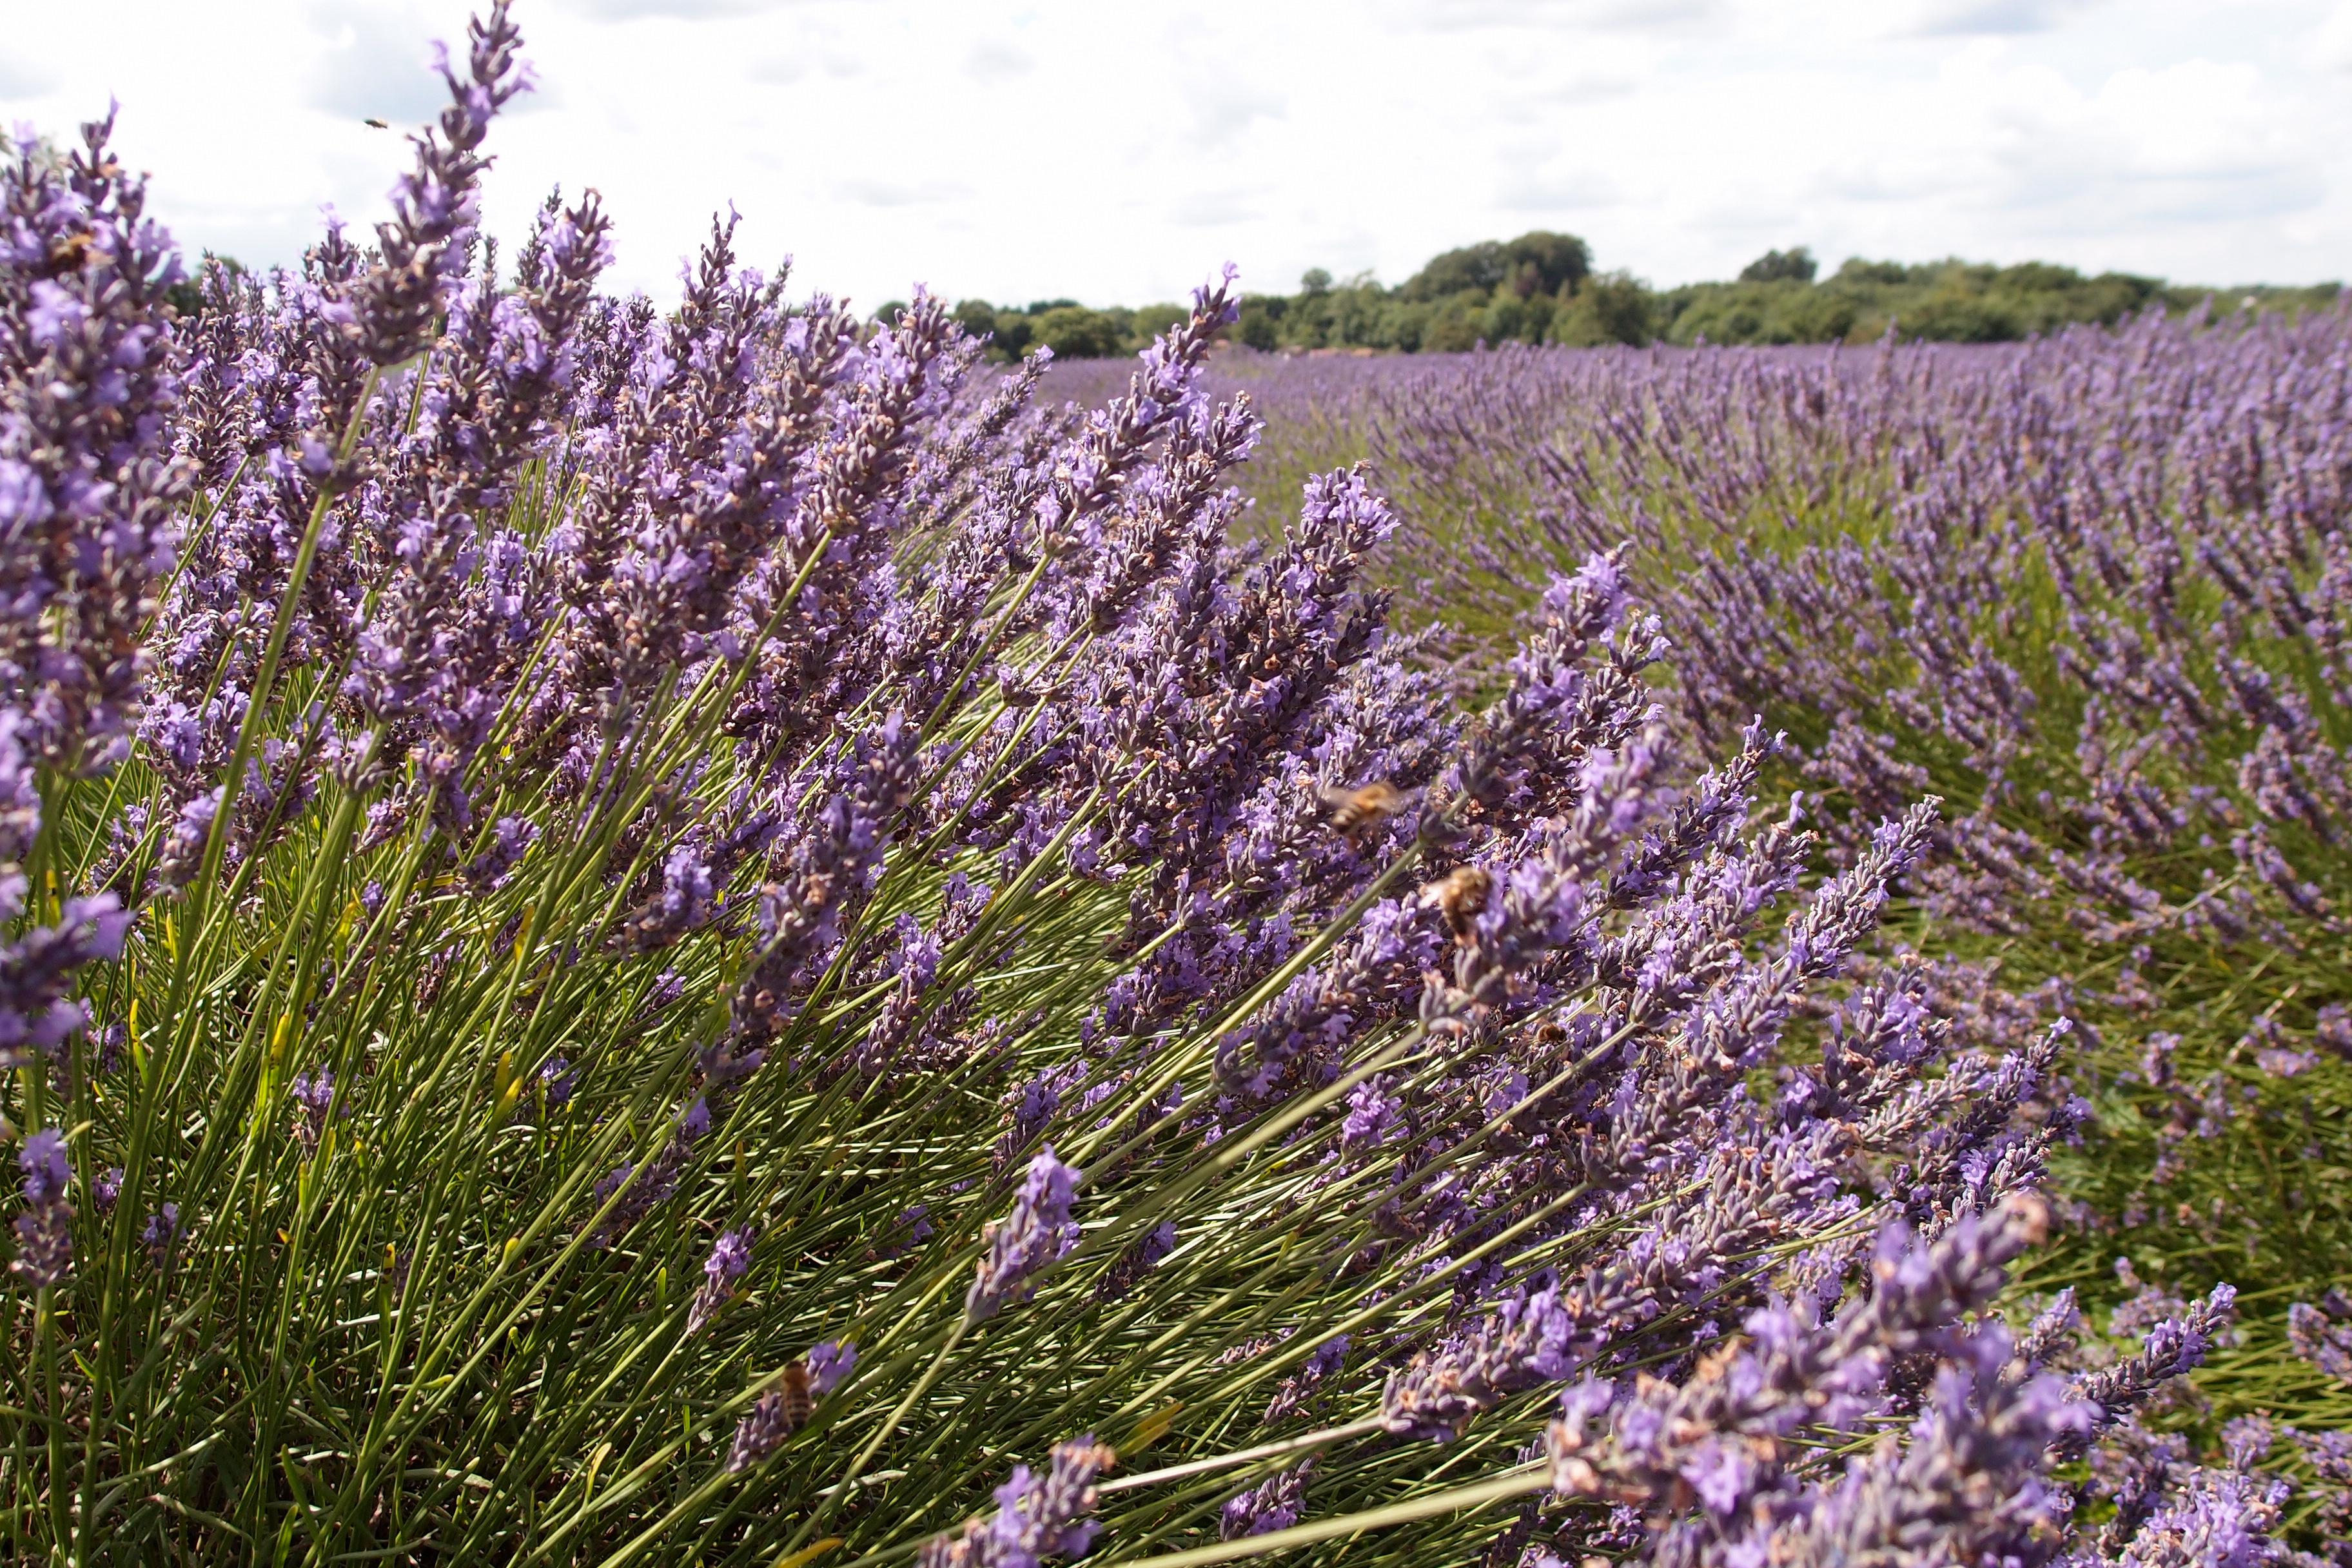 Mayfield Lavender は、とても可愛らしいラベンダー園でした!